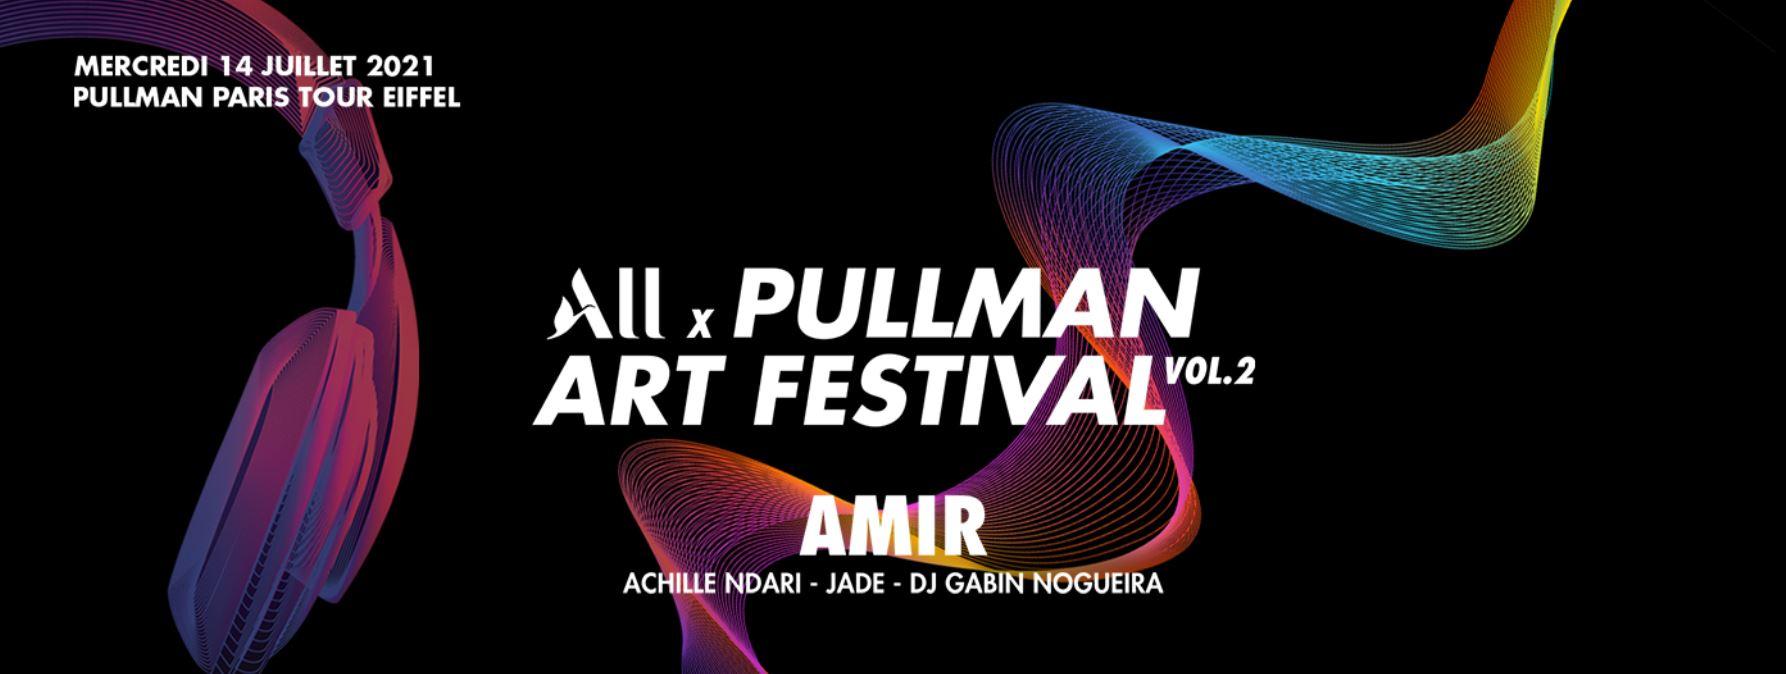 allpullmanfestival